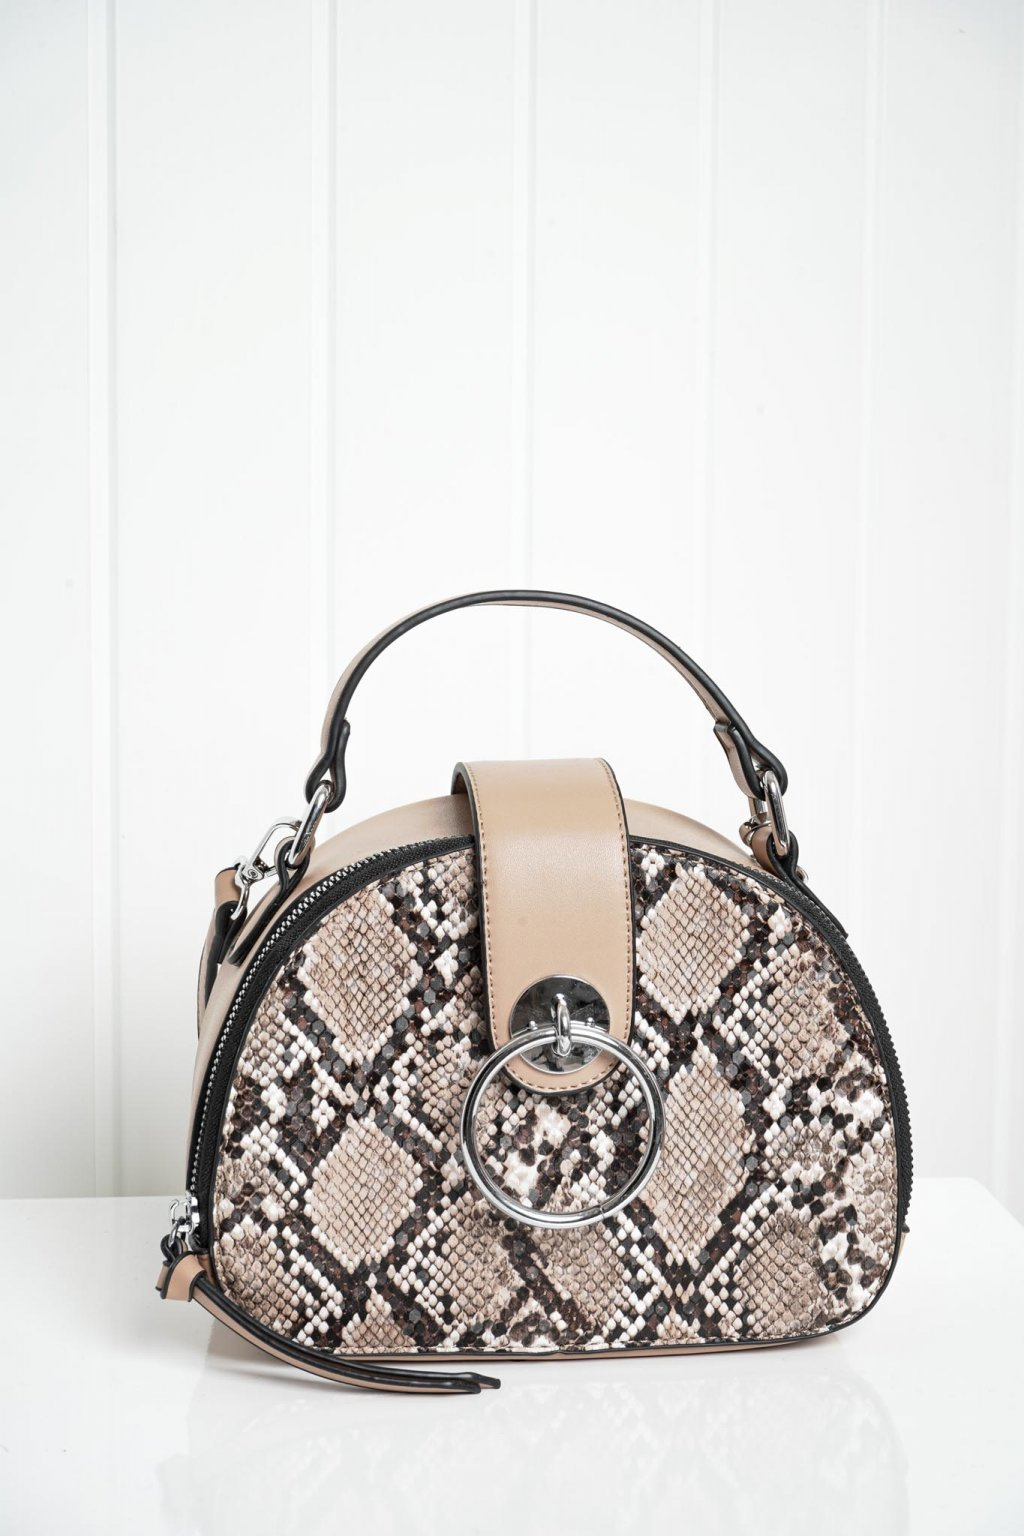 Kabelka, crossbody, ruksak, shopping bag, shopperka, 056